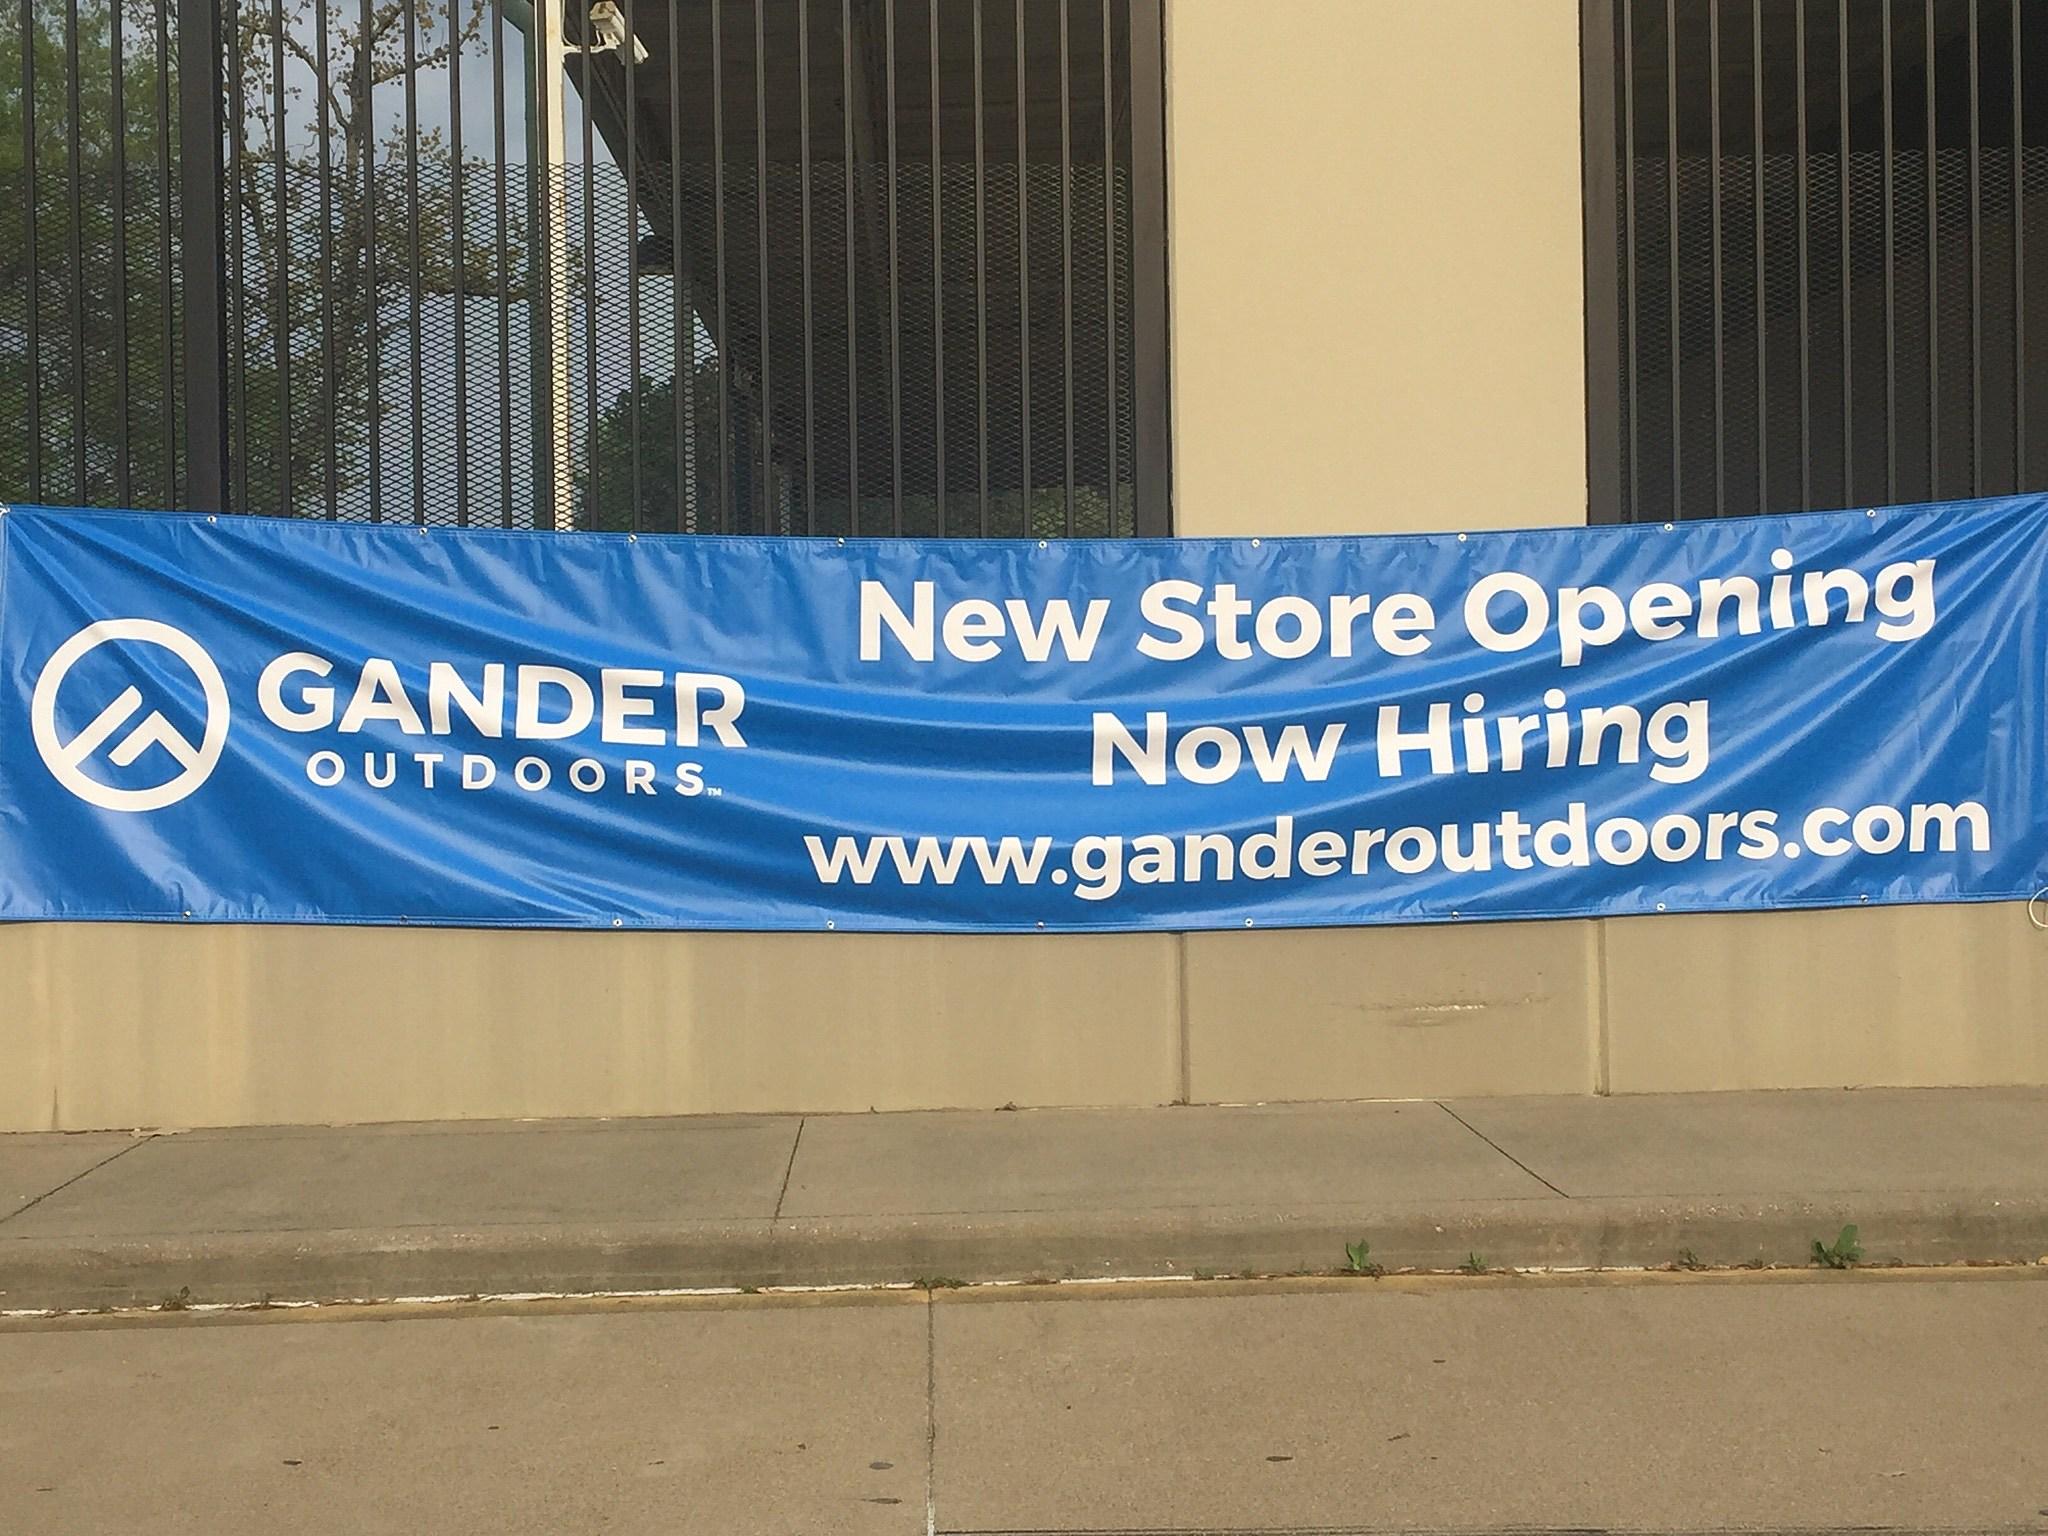 Gander Mountain To Re-Open As Gander Outdoors In Tyler